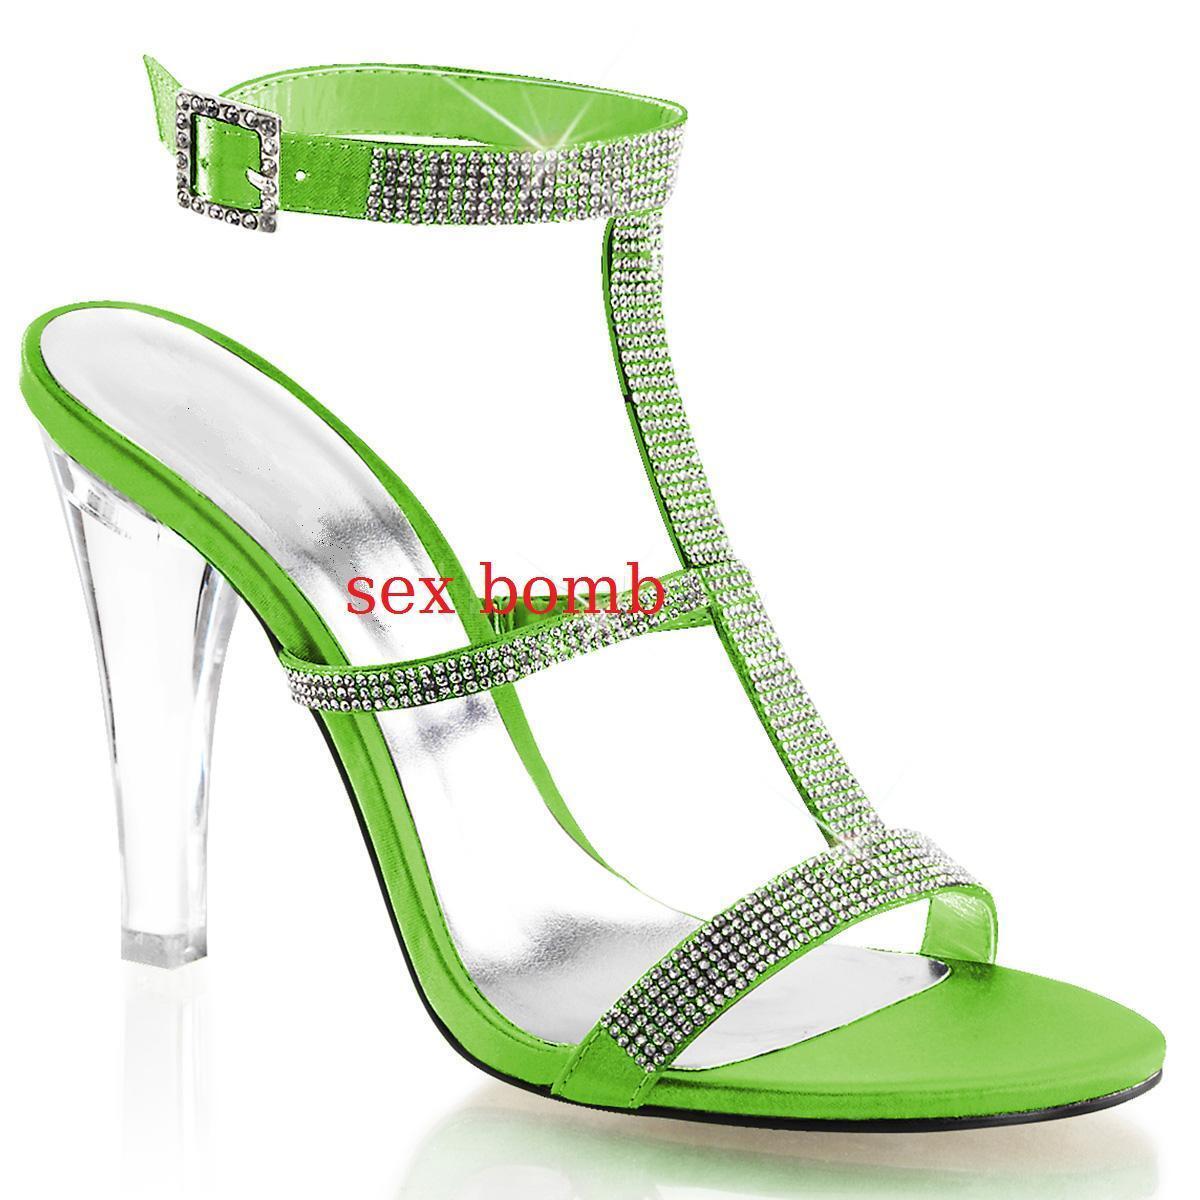 SEXY sandali STRASS tacco 11,5 dal 35 chic al 42 VERDE MELA/TRASPARENTE chic 35 GLAMOUR 7b982a